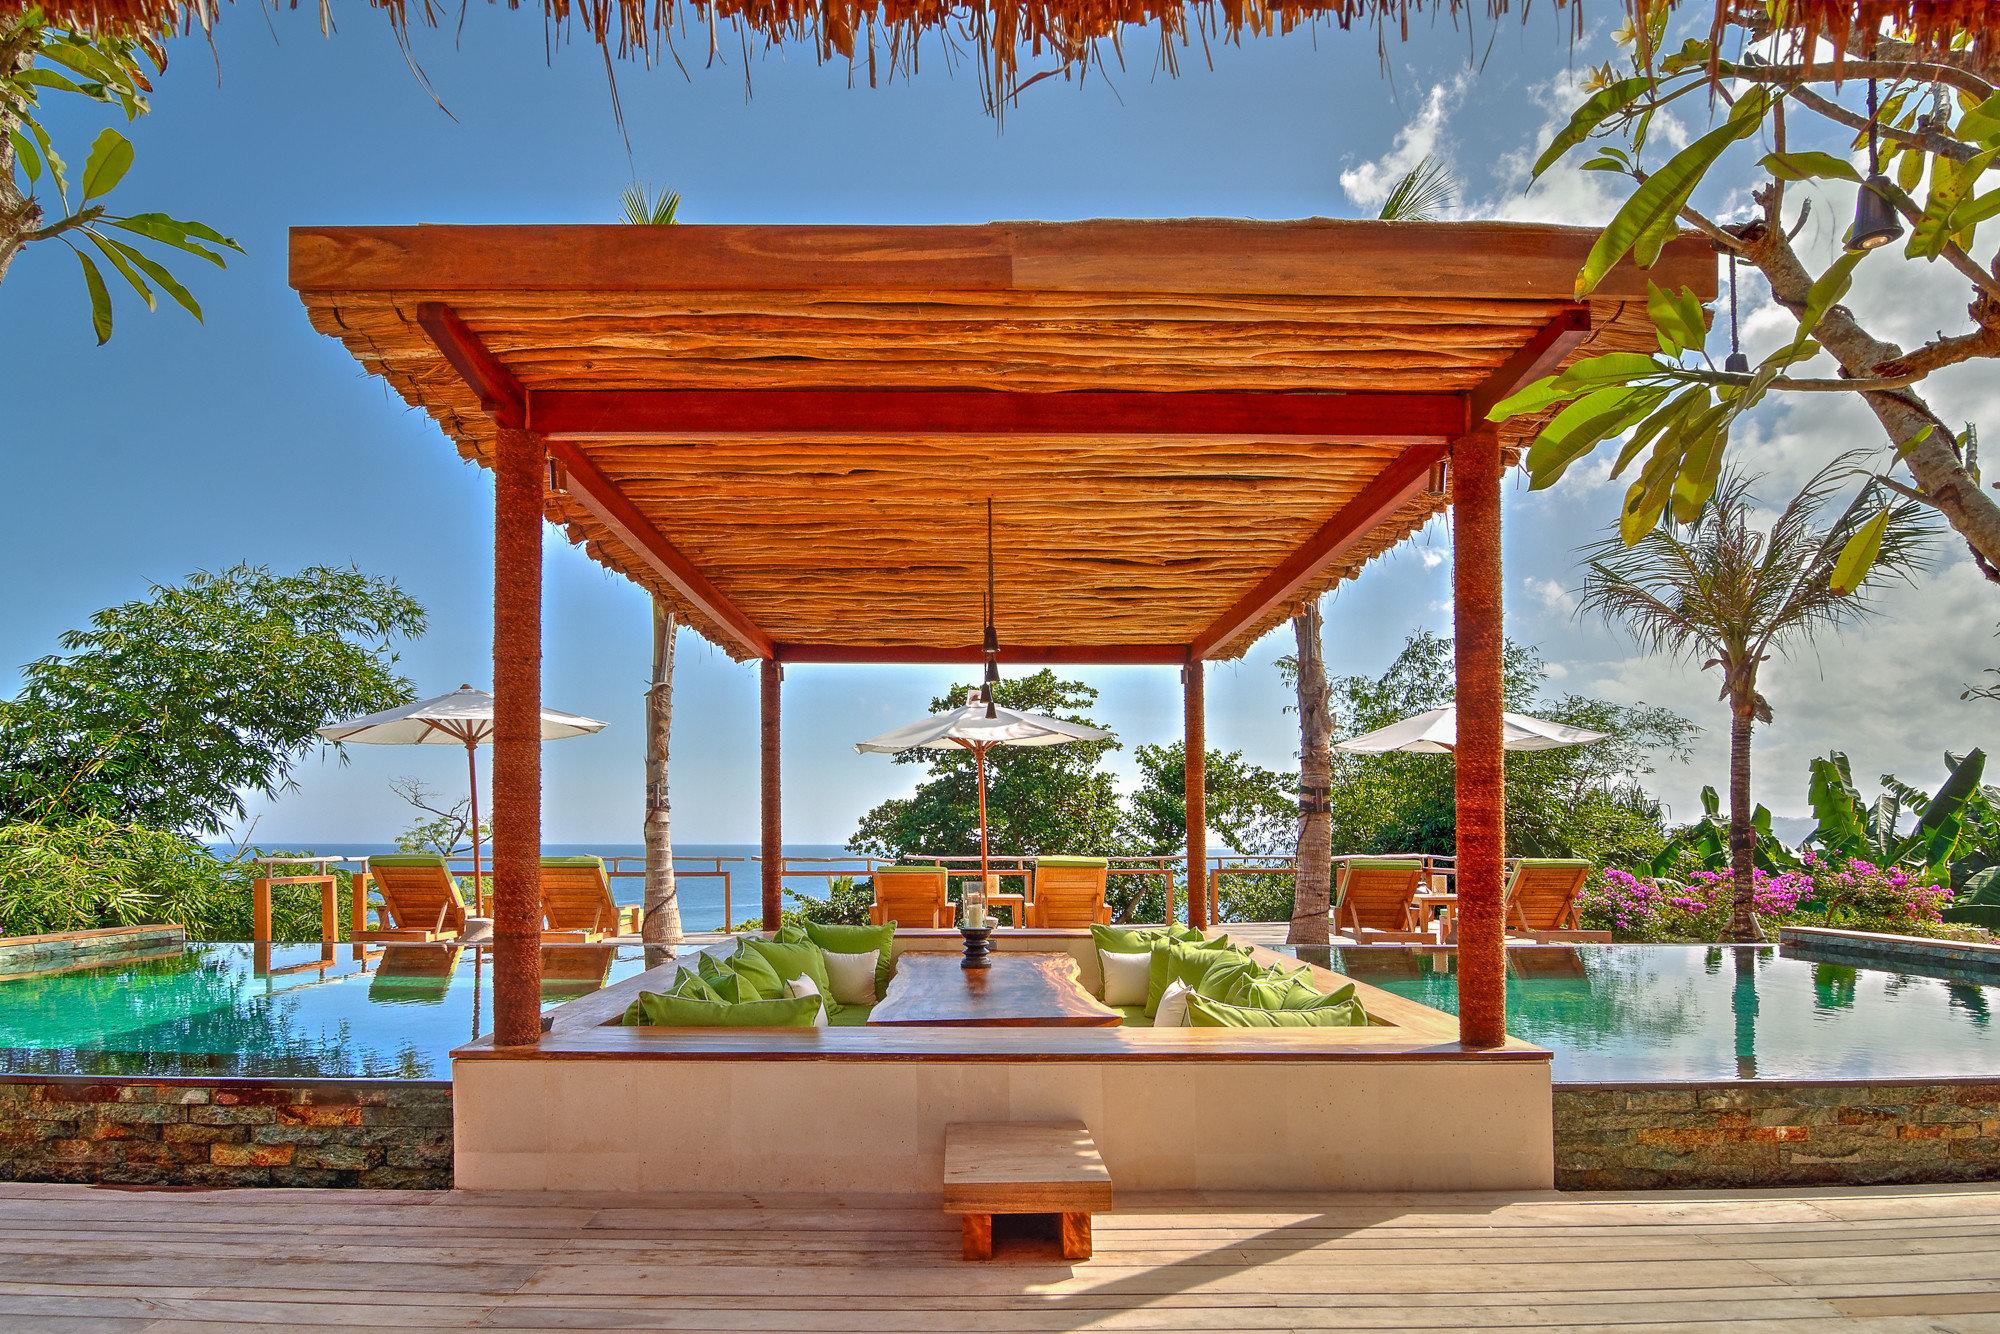 Beach Islands Luxury Travel Trip Ideas tree outdoor sky building pavilion estate outdoor structure shrine temple Resort furniture